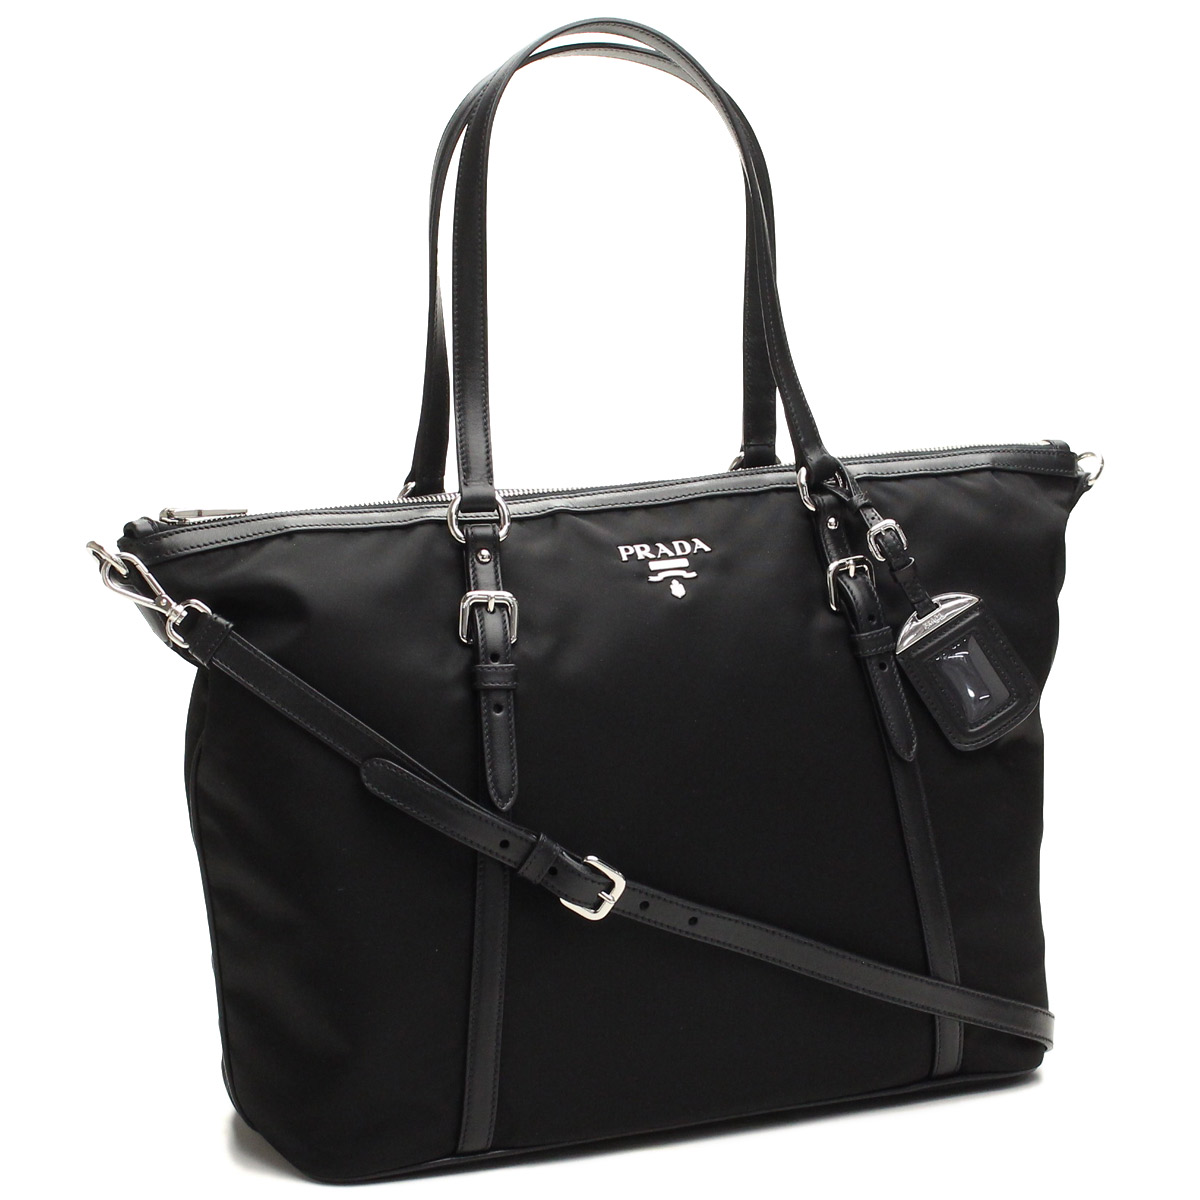 )Prada outlet PRADA (OUTLET) tote bag B4253M-O-QXO-F0002 NERO black(  taxfree send by EMS authentic A brand new item )  2885d8b4e7fe